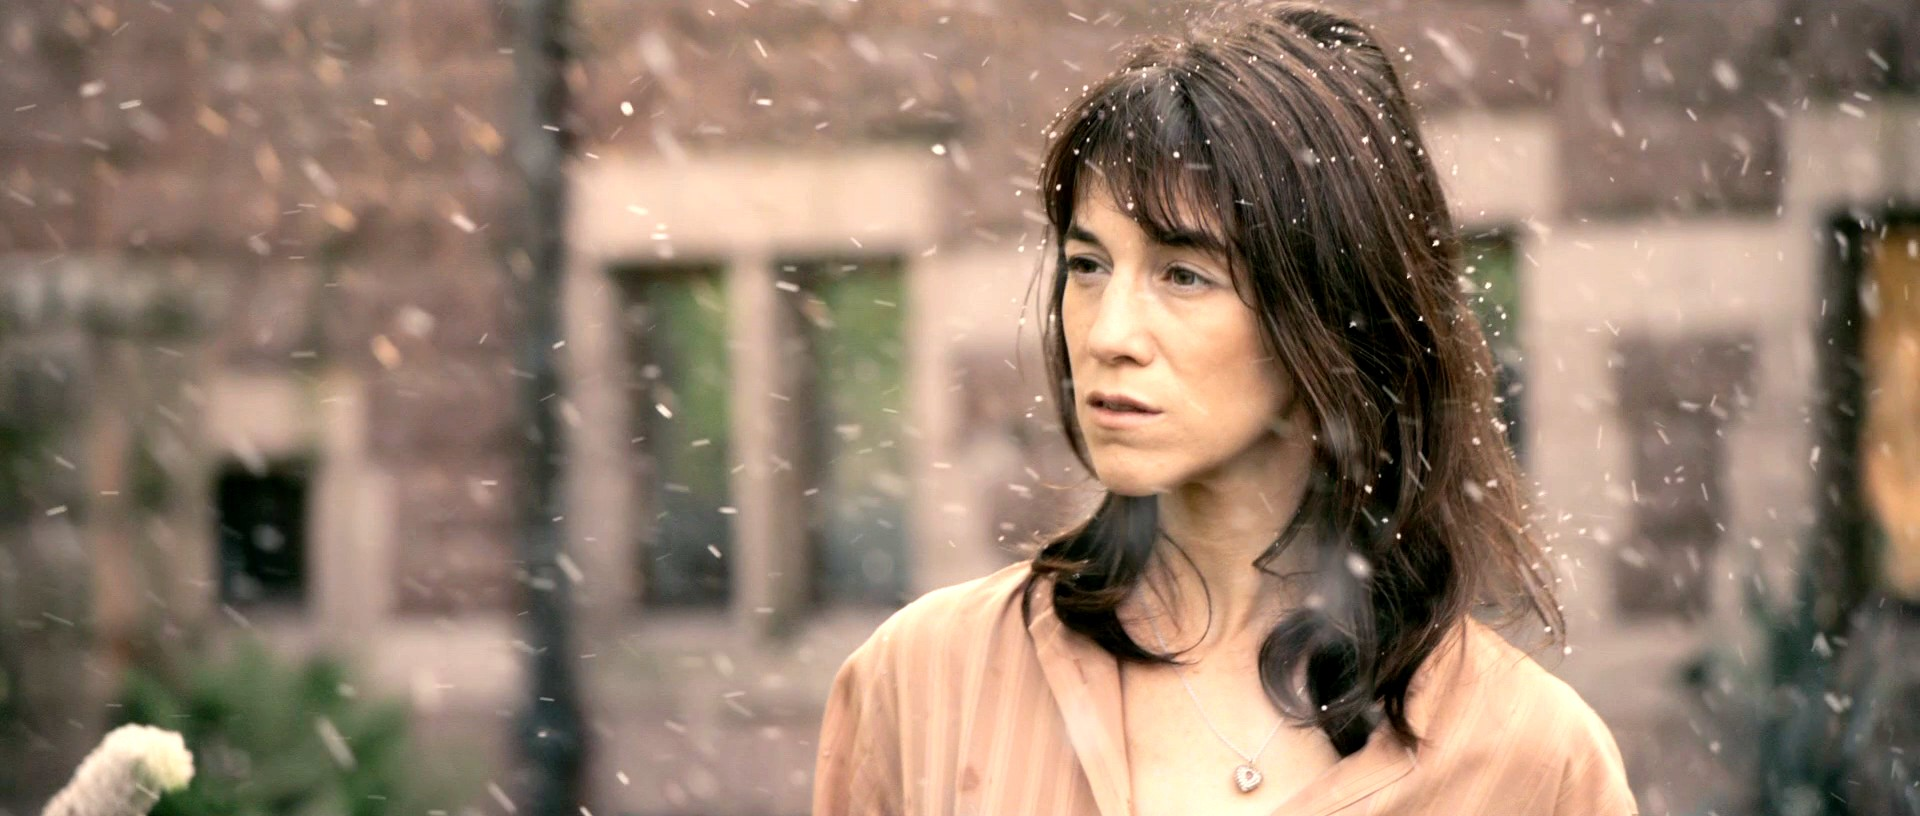 charlotte gainsbourg- melancholia